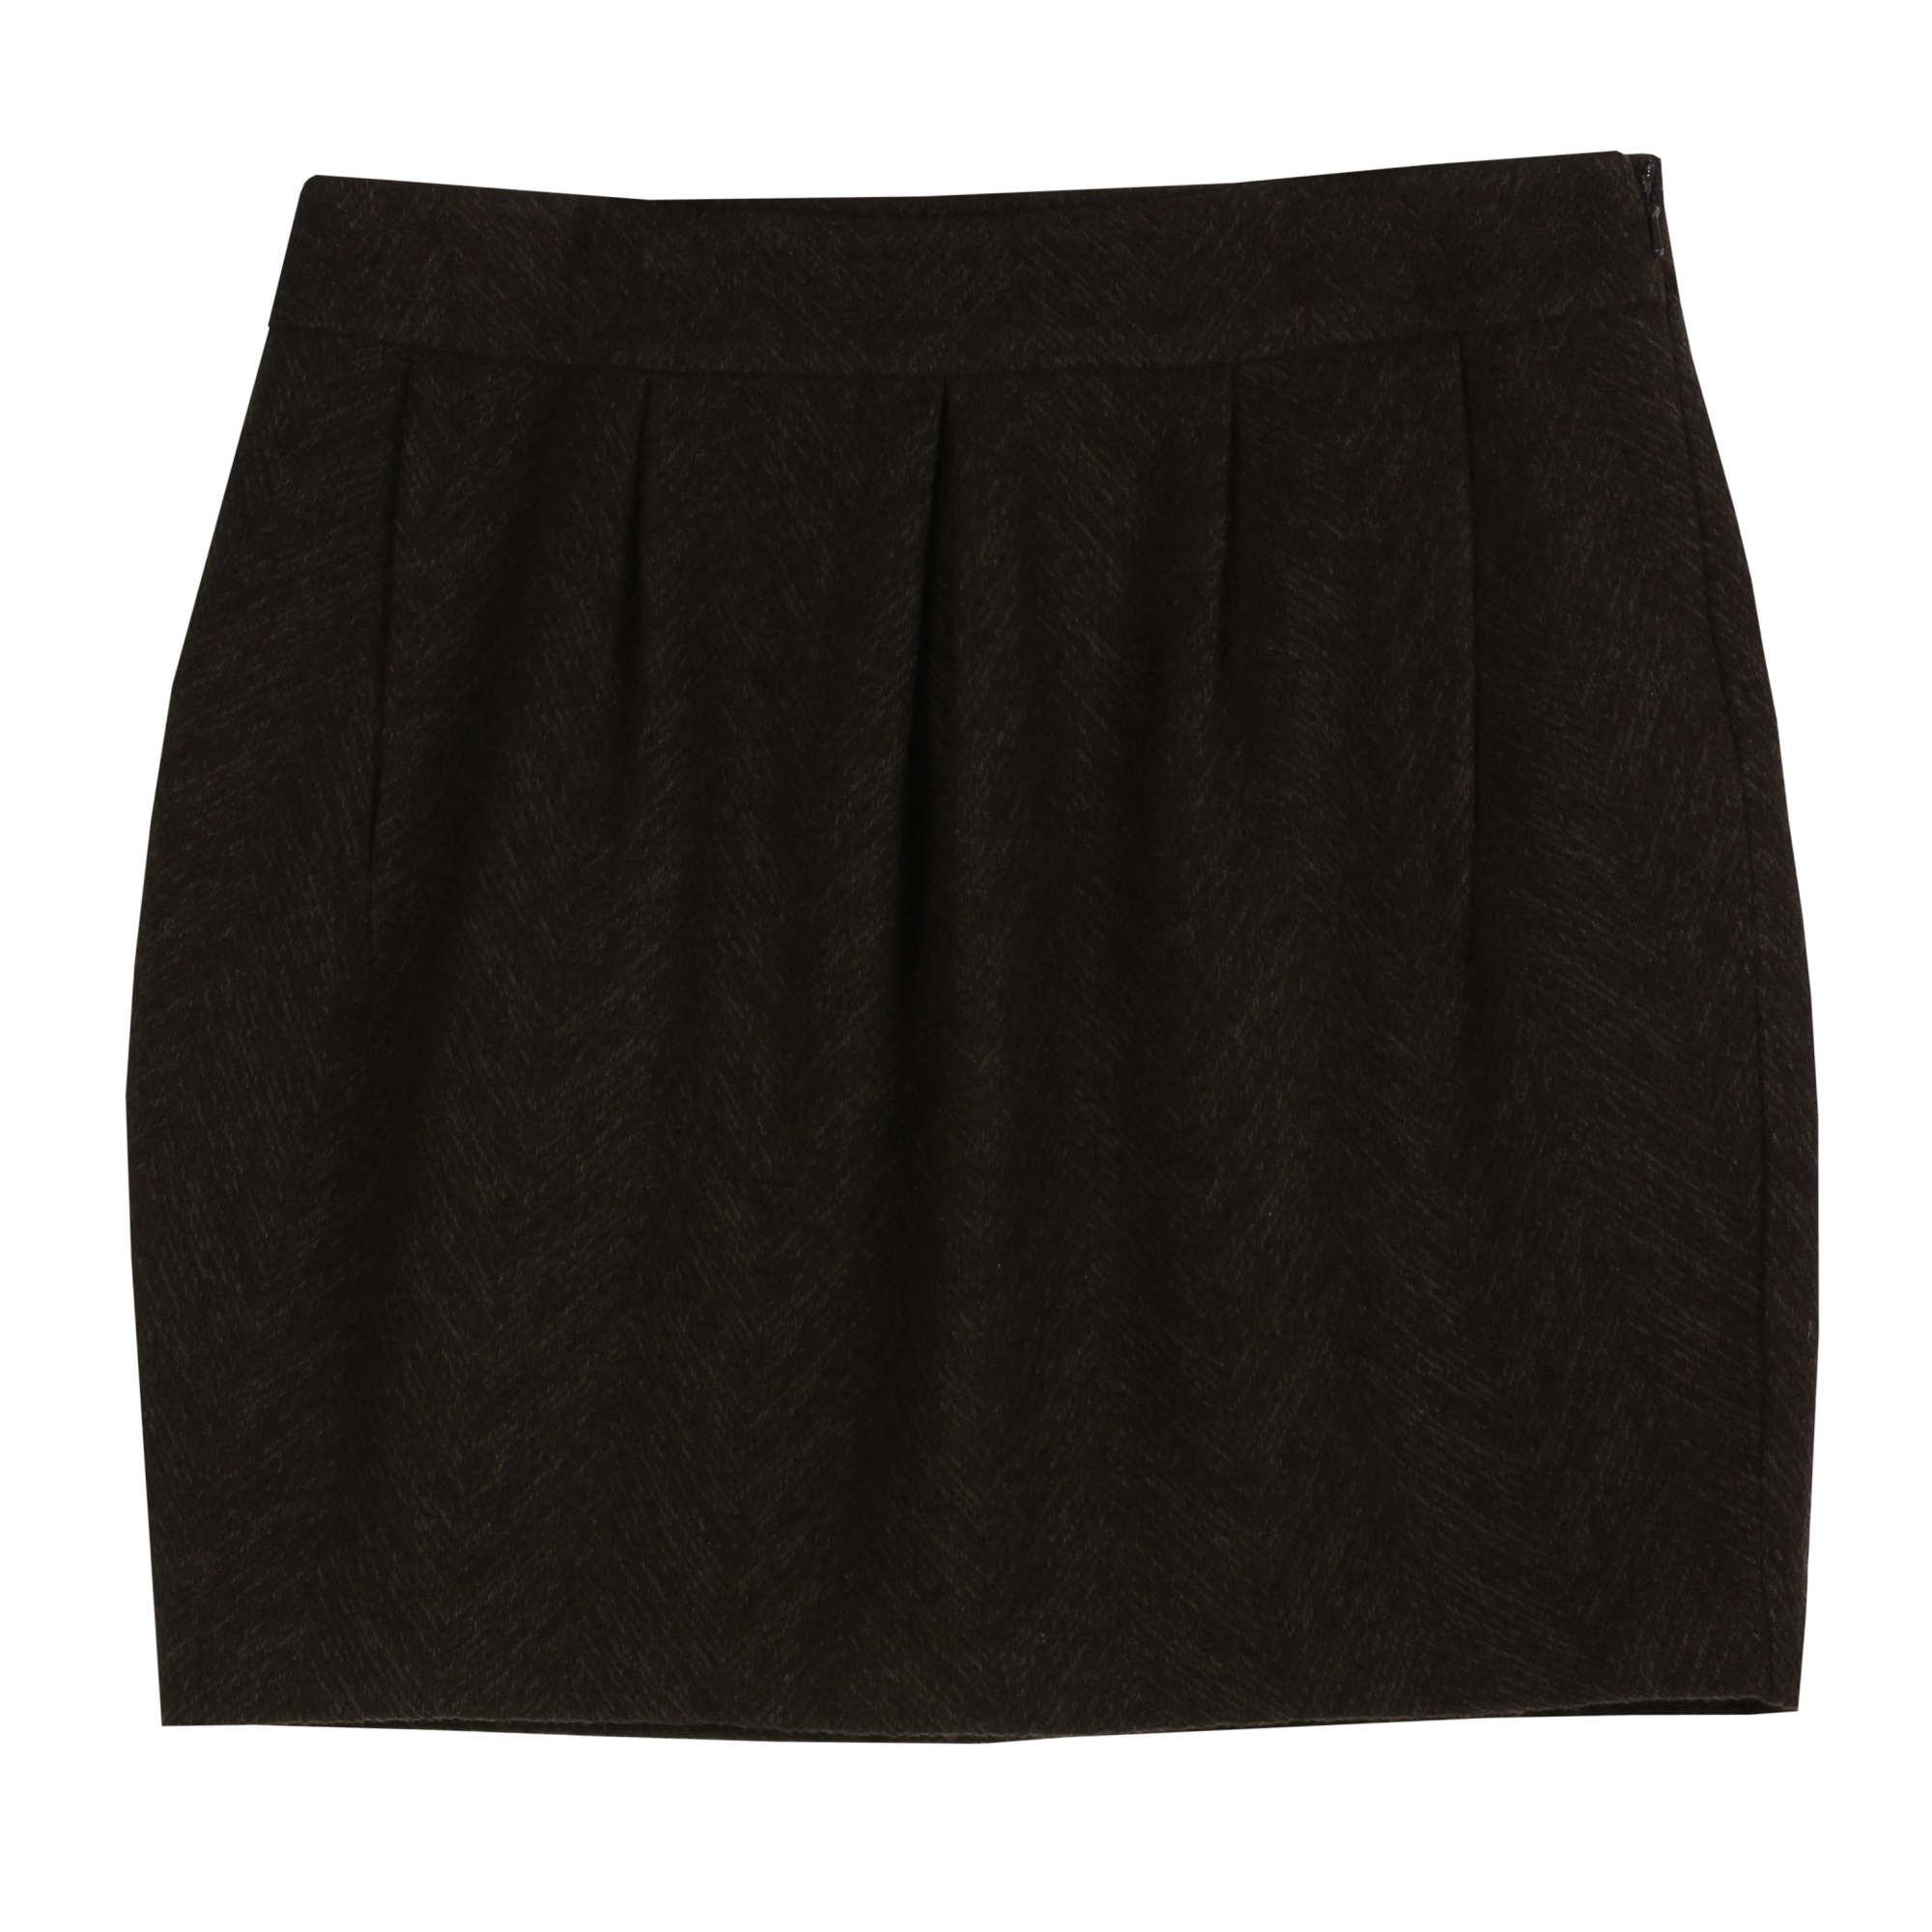 Herringbone Distorted Skirt